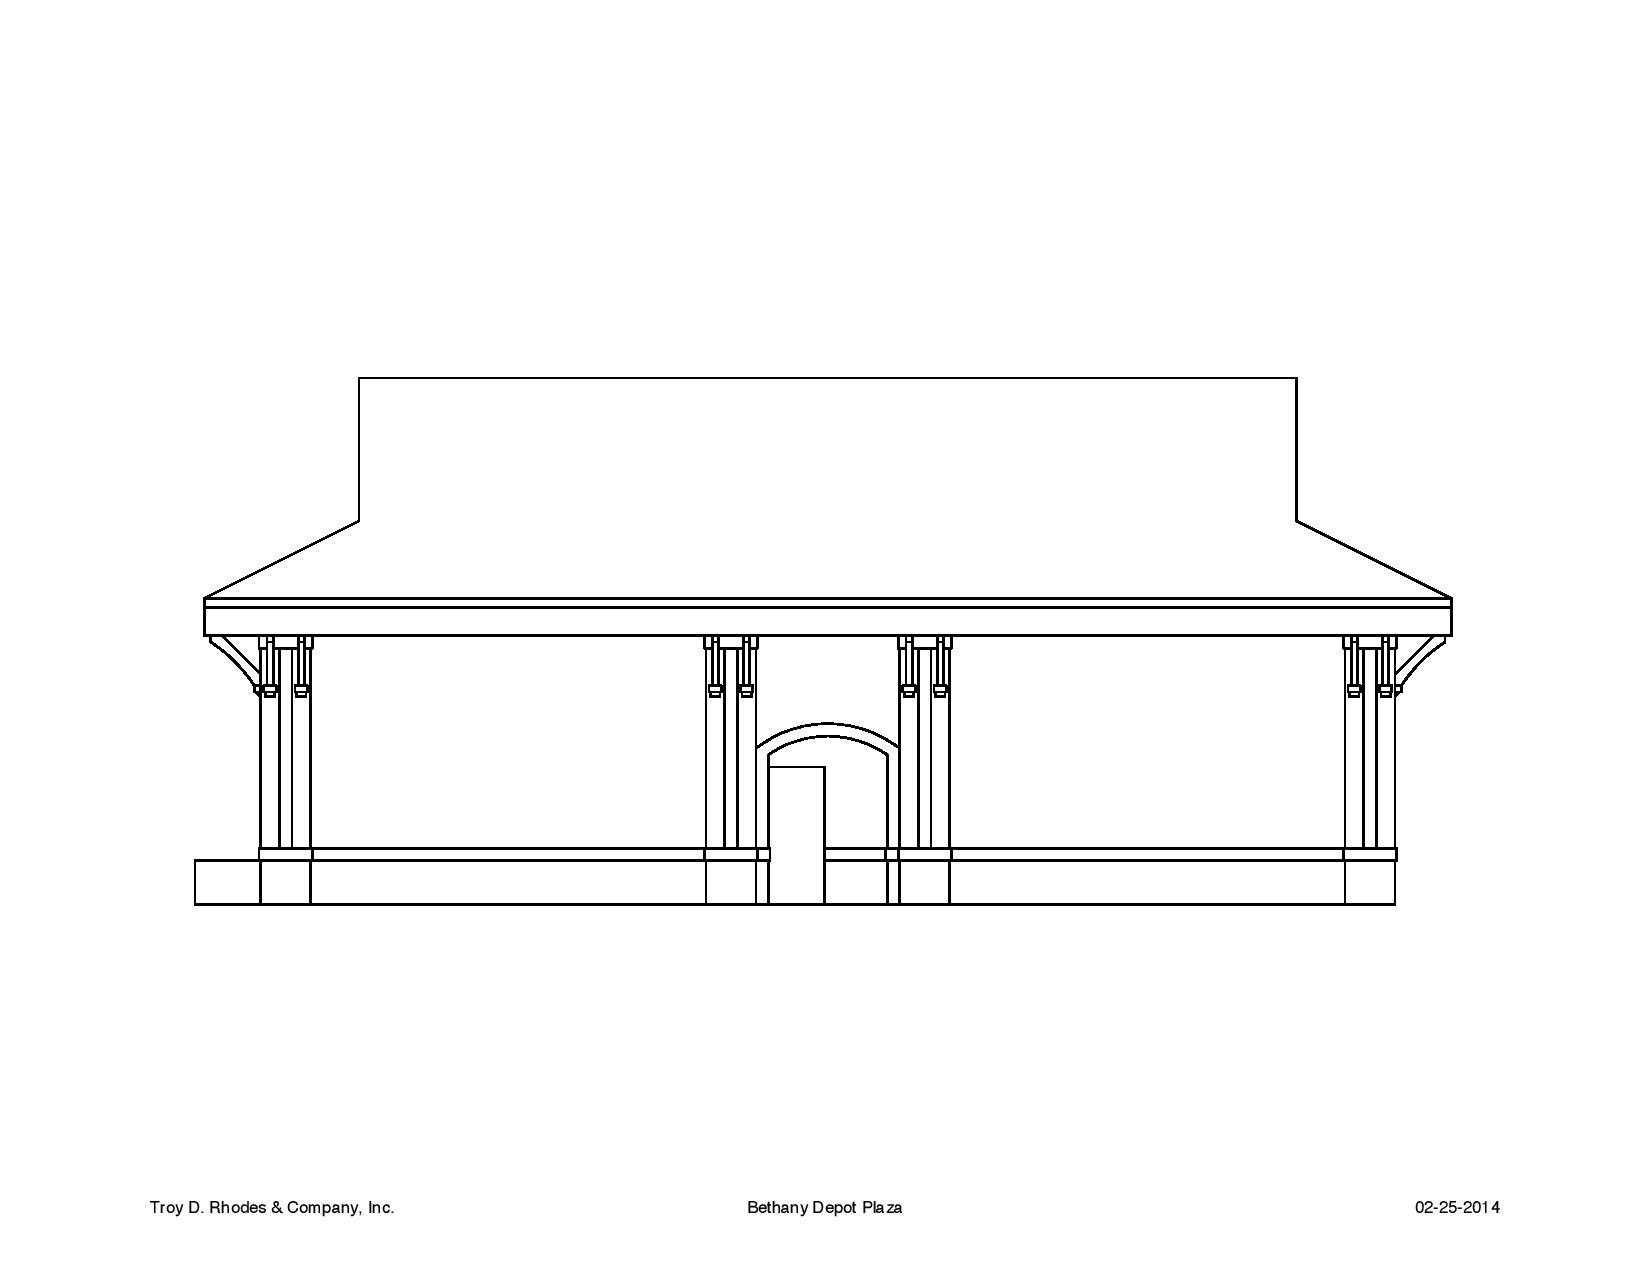 Bethany Depot Plaza Final 2-25-14-page-008.jpg